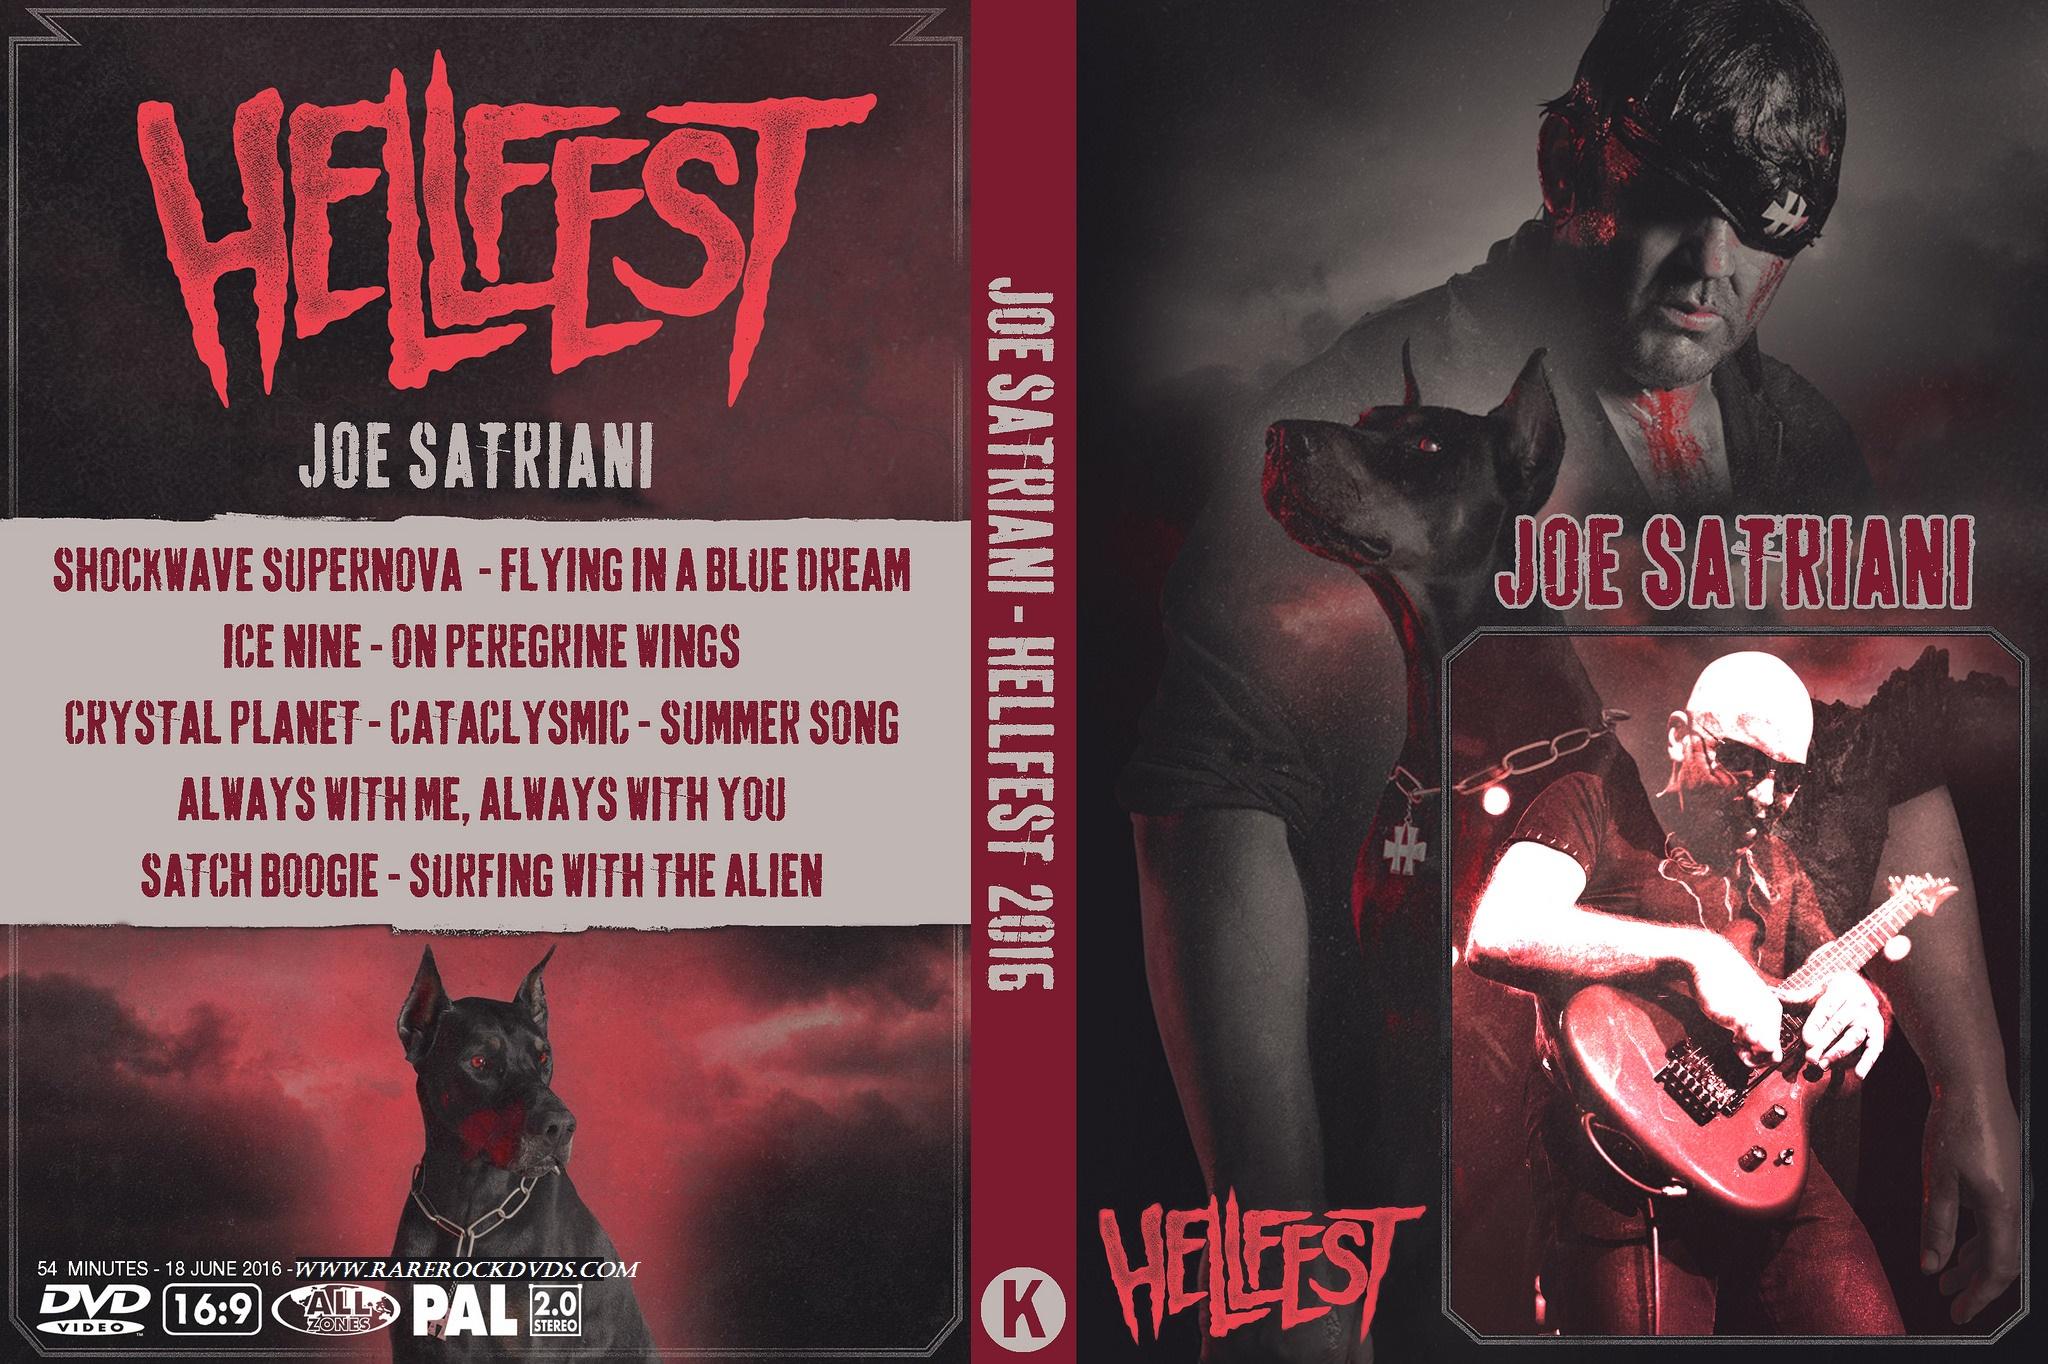 Joe Satriani - Live Hellfest 2016 DVD